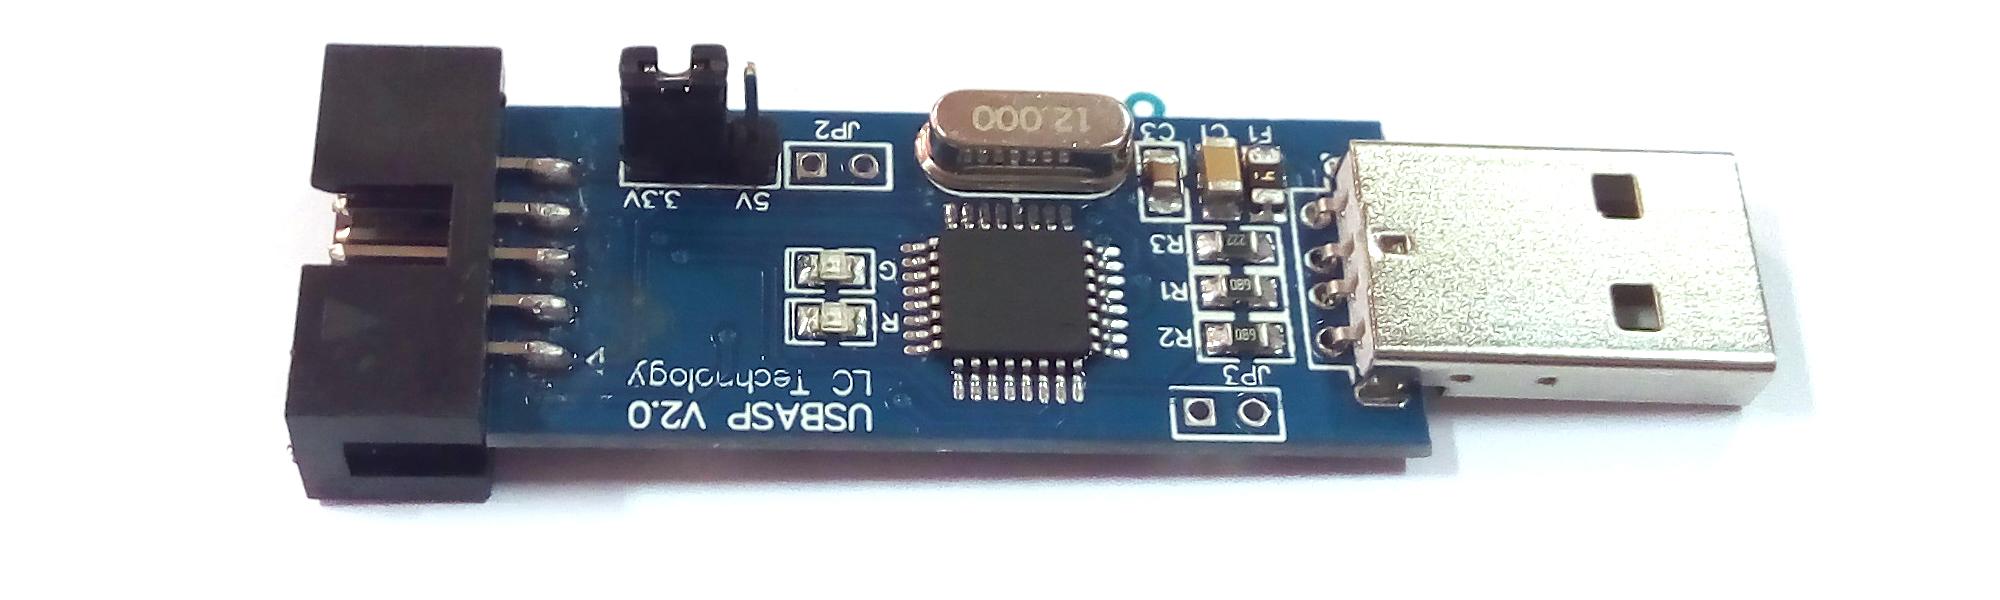 Обзор программатора USBAsp v.2.0